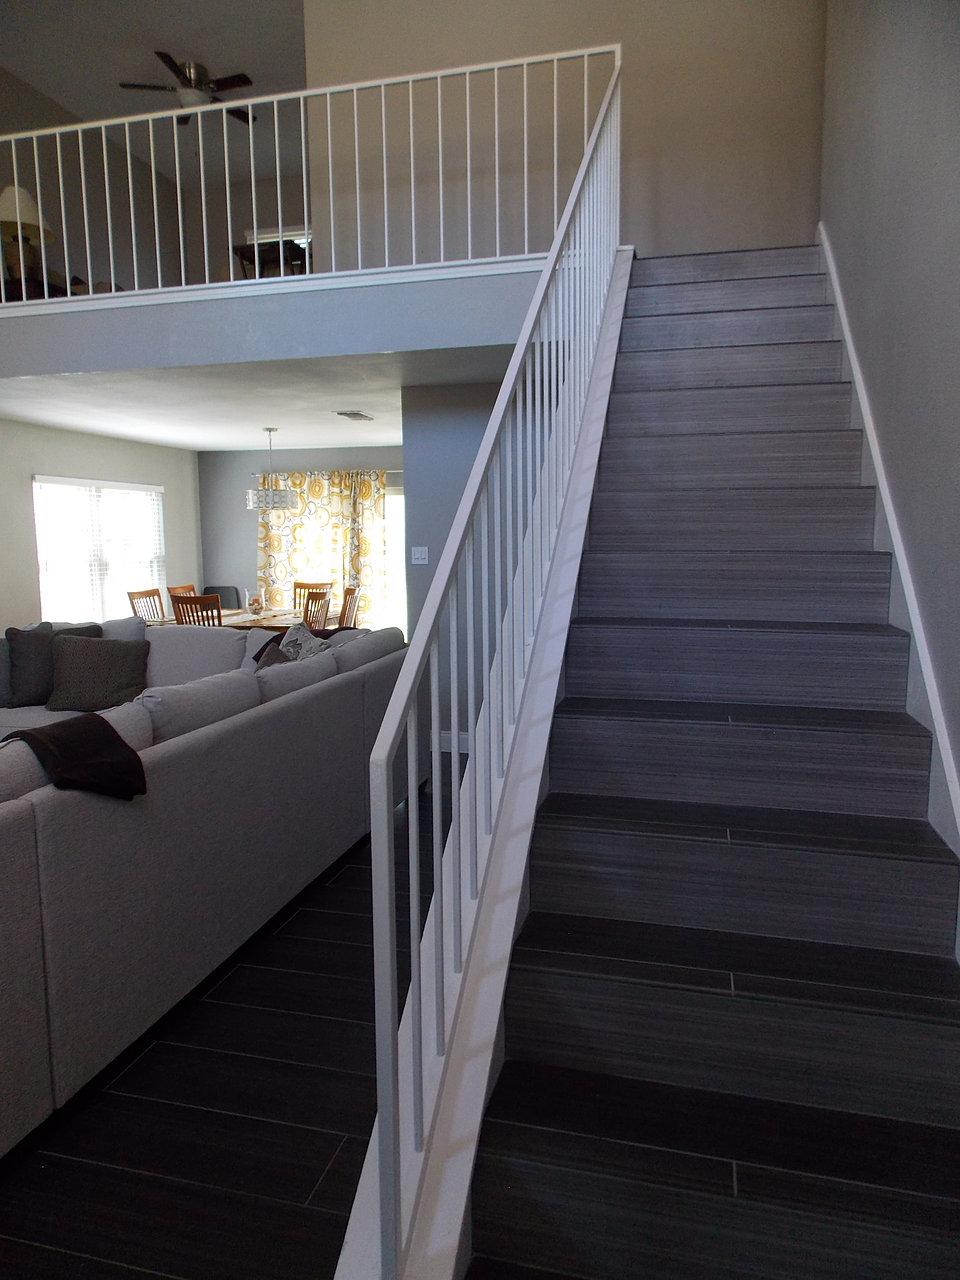 Kitchen Remodeling San Antonio San Antonio Based General Contractor Specializing In Home Improvements